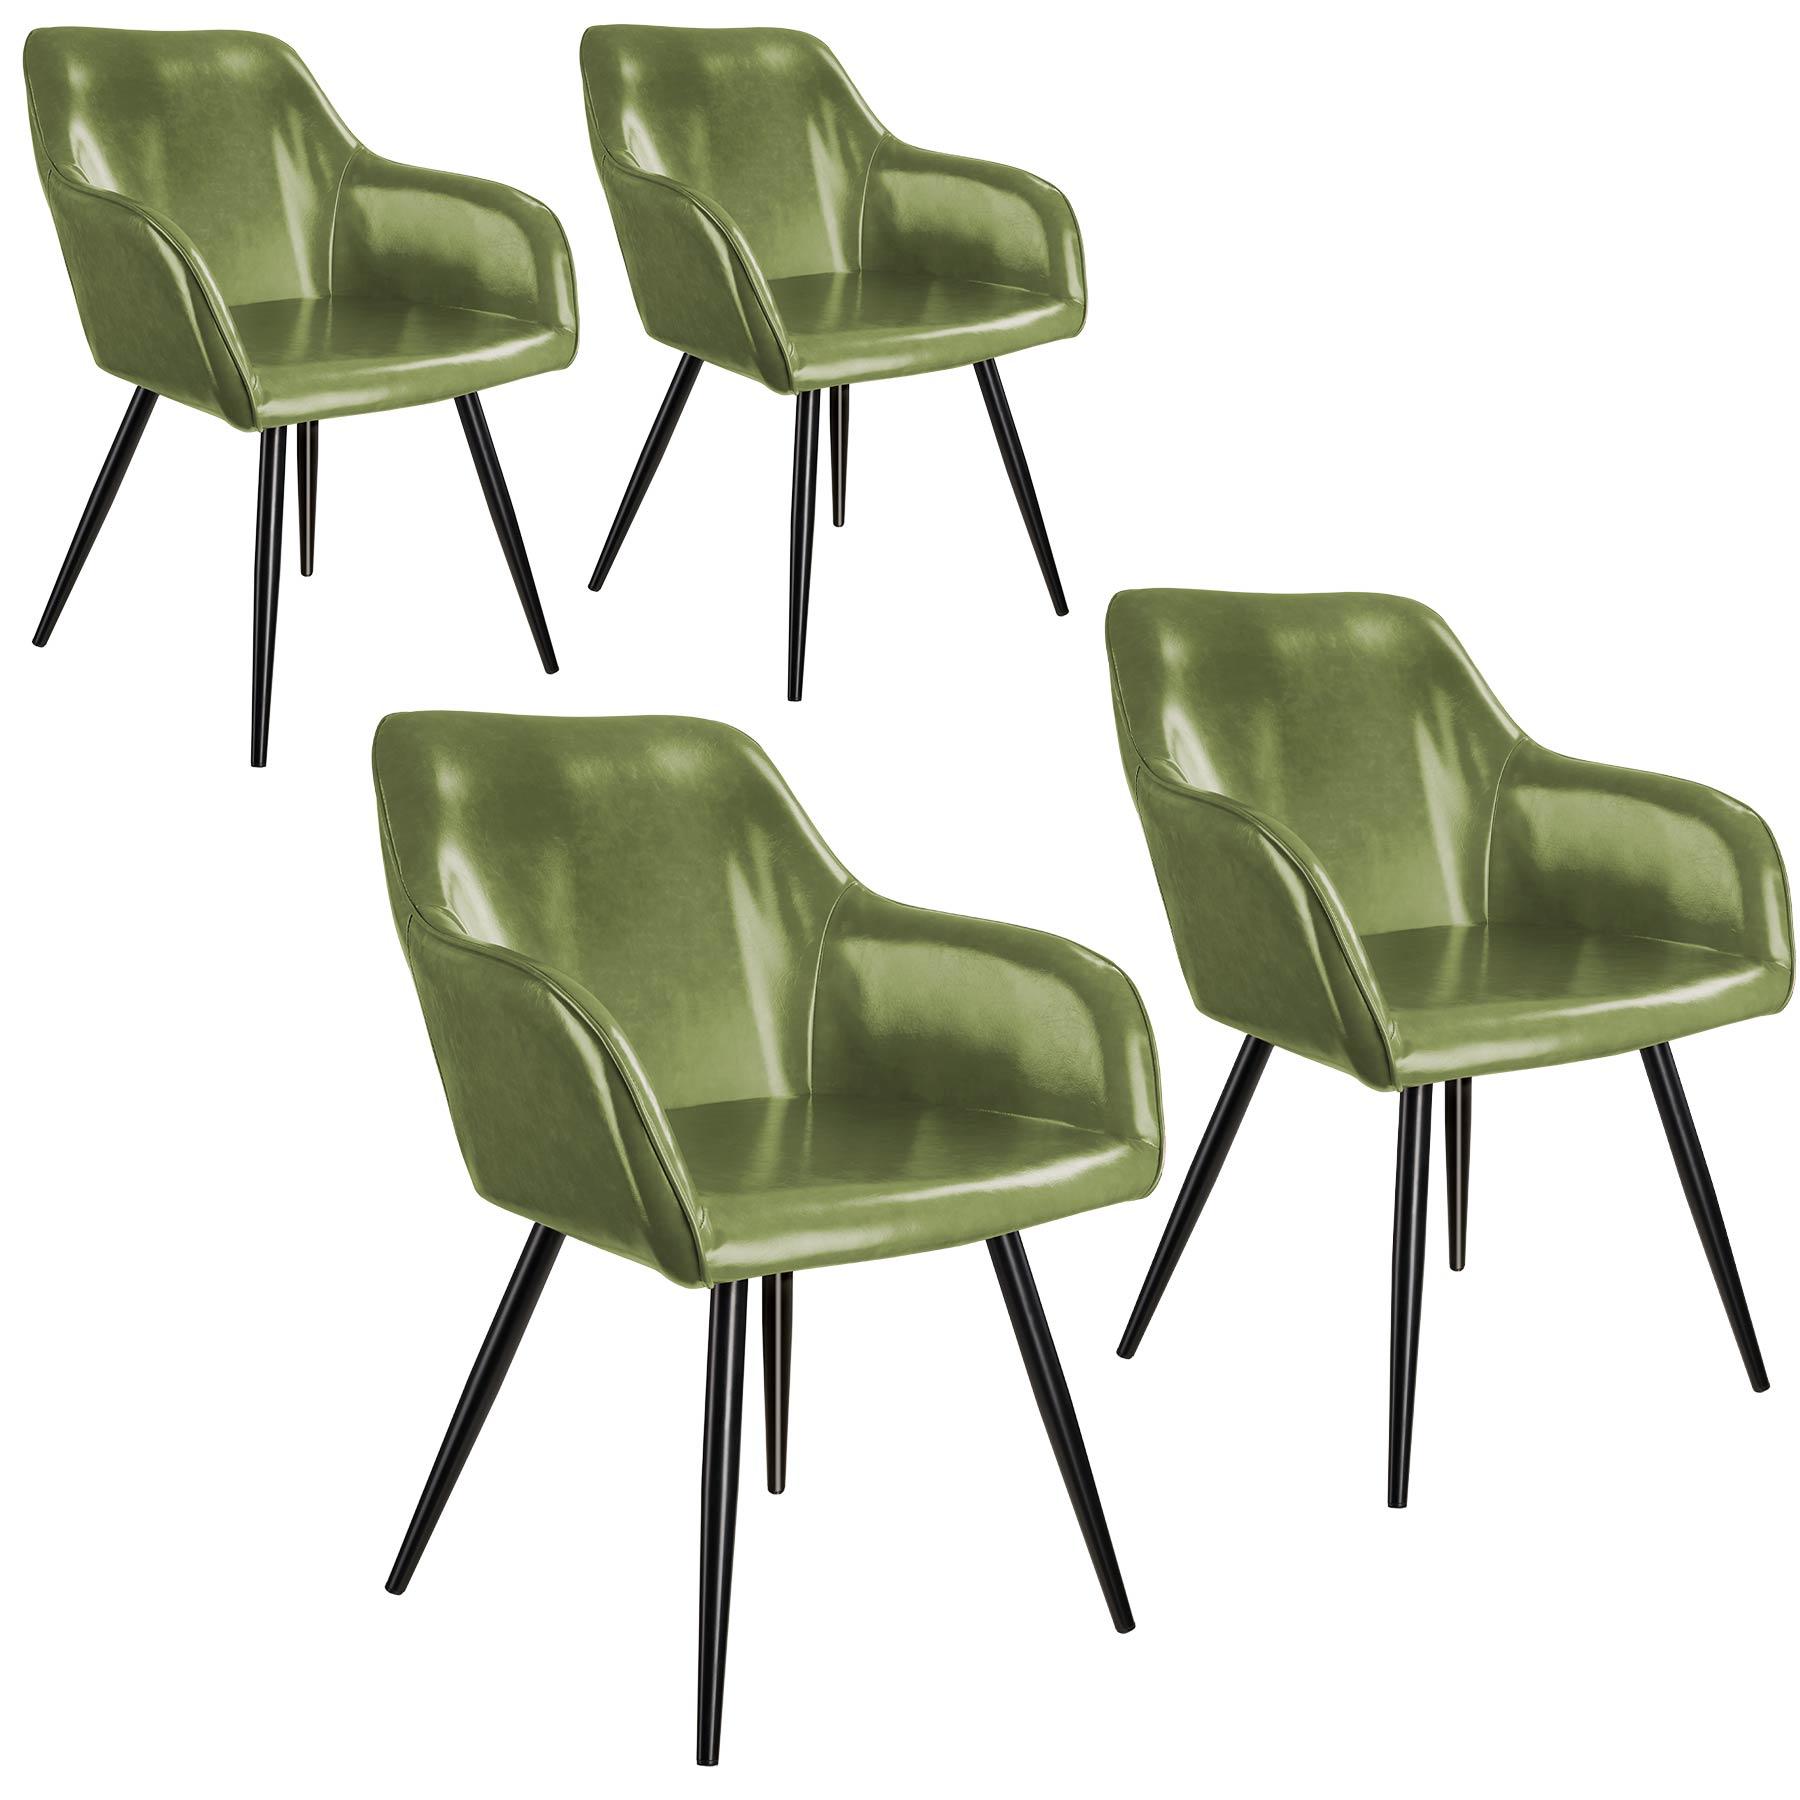 tectake 4 Marilyn Faux Leather Chairs - dark green/black